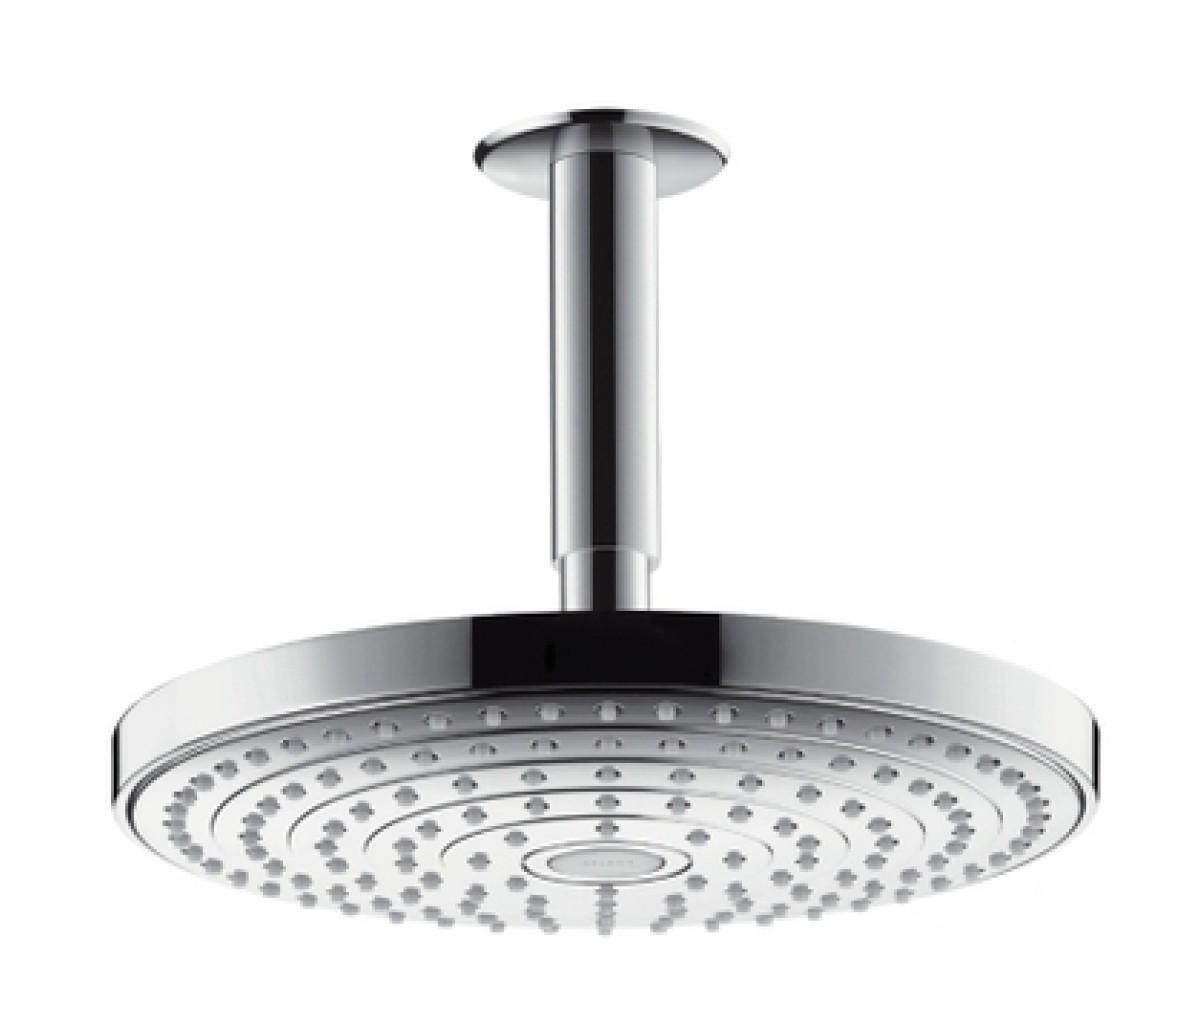 Верхний душ HANSGROHE Raindance Select S 240 2jet (26467000)